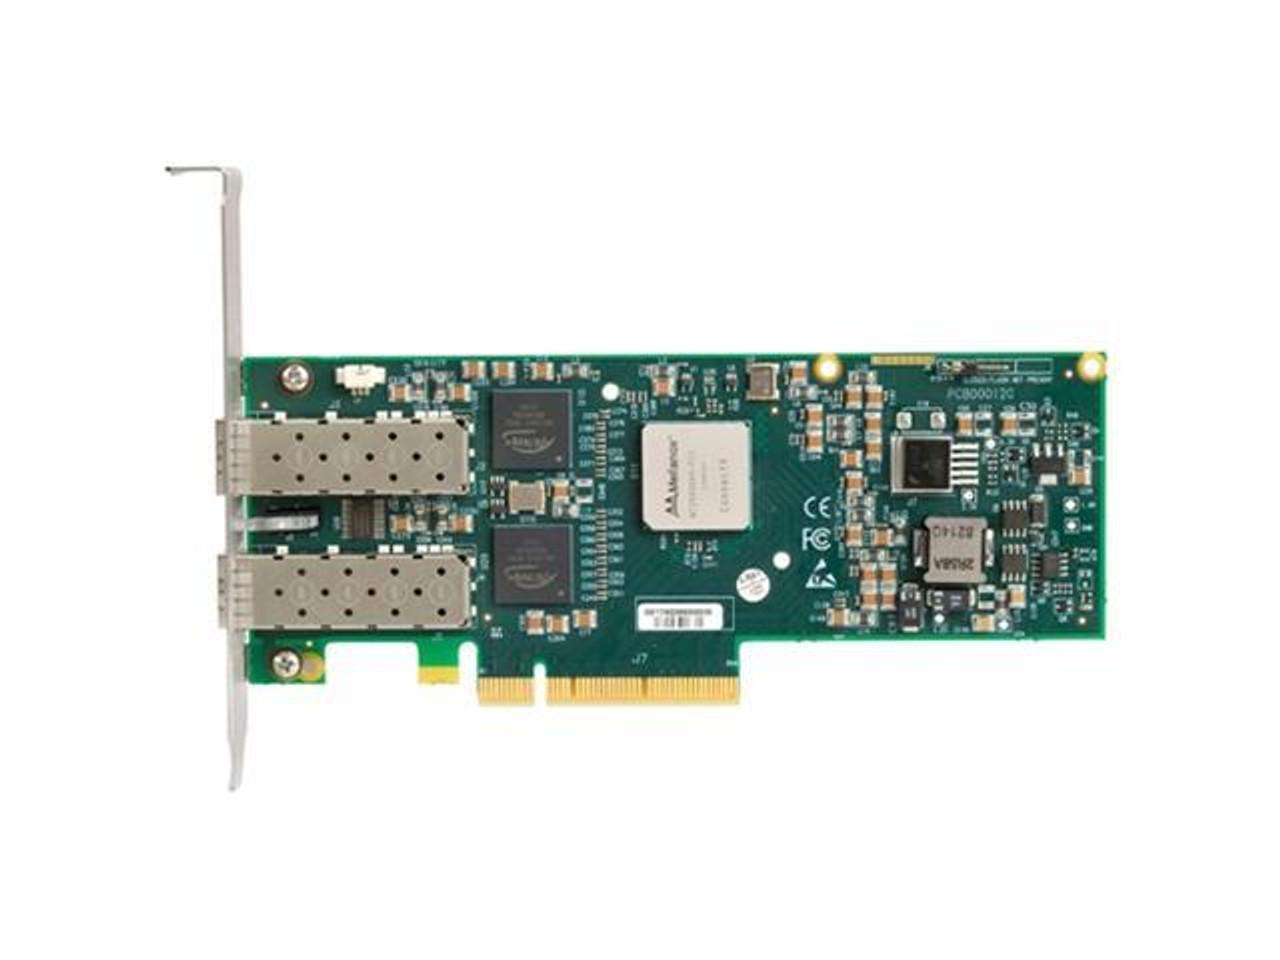 Mellanox MNPH29C-XTR Network Card Last